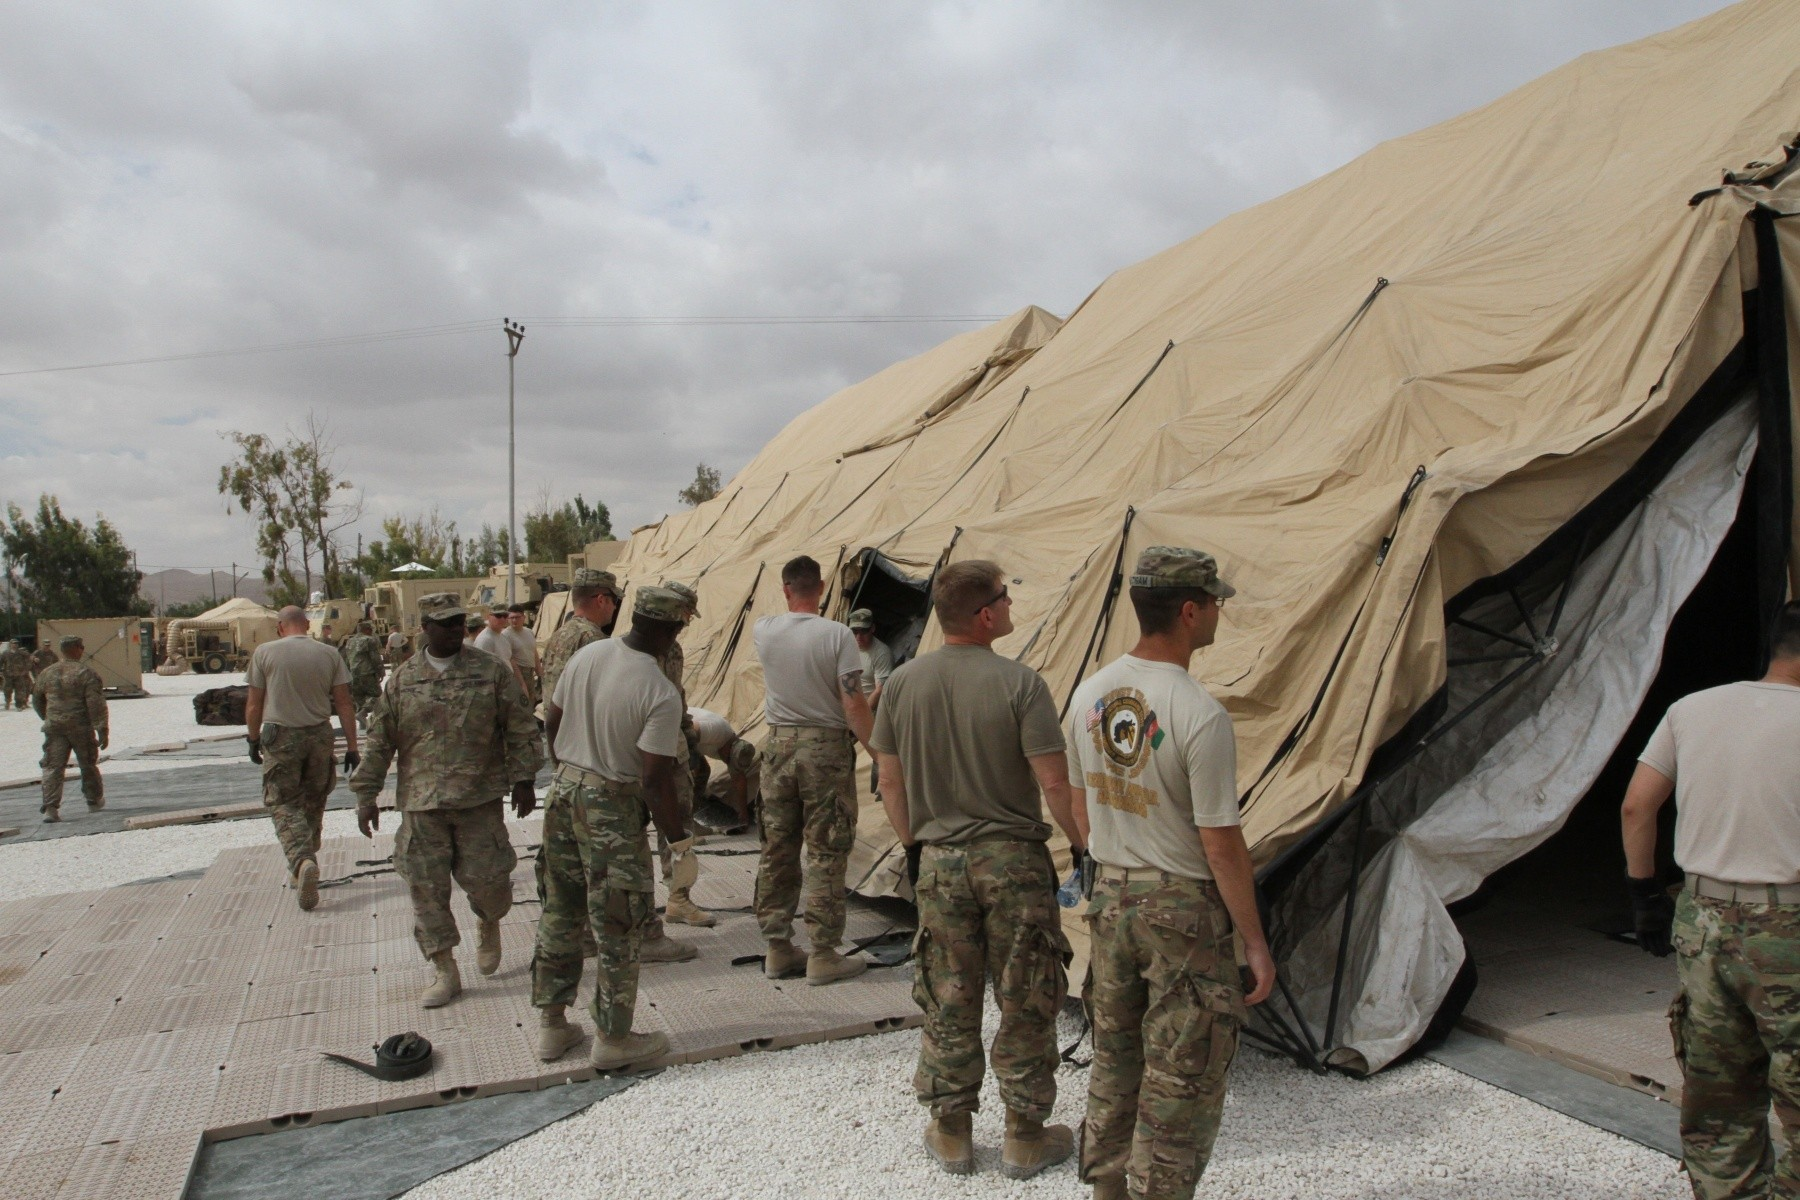 100+ Drash Tent Interior – yasminroohi